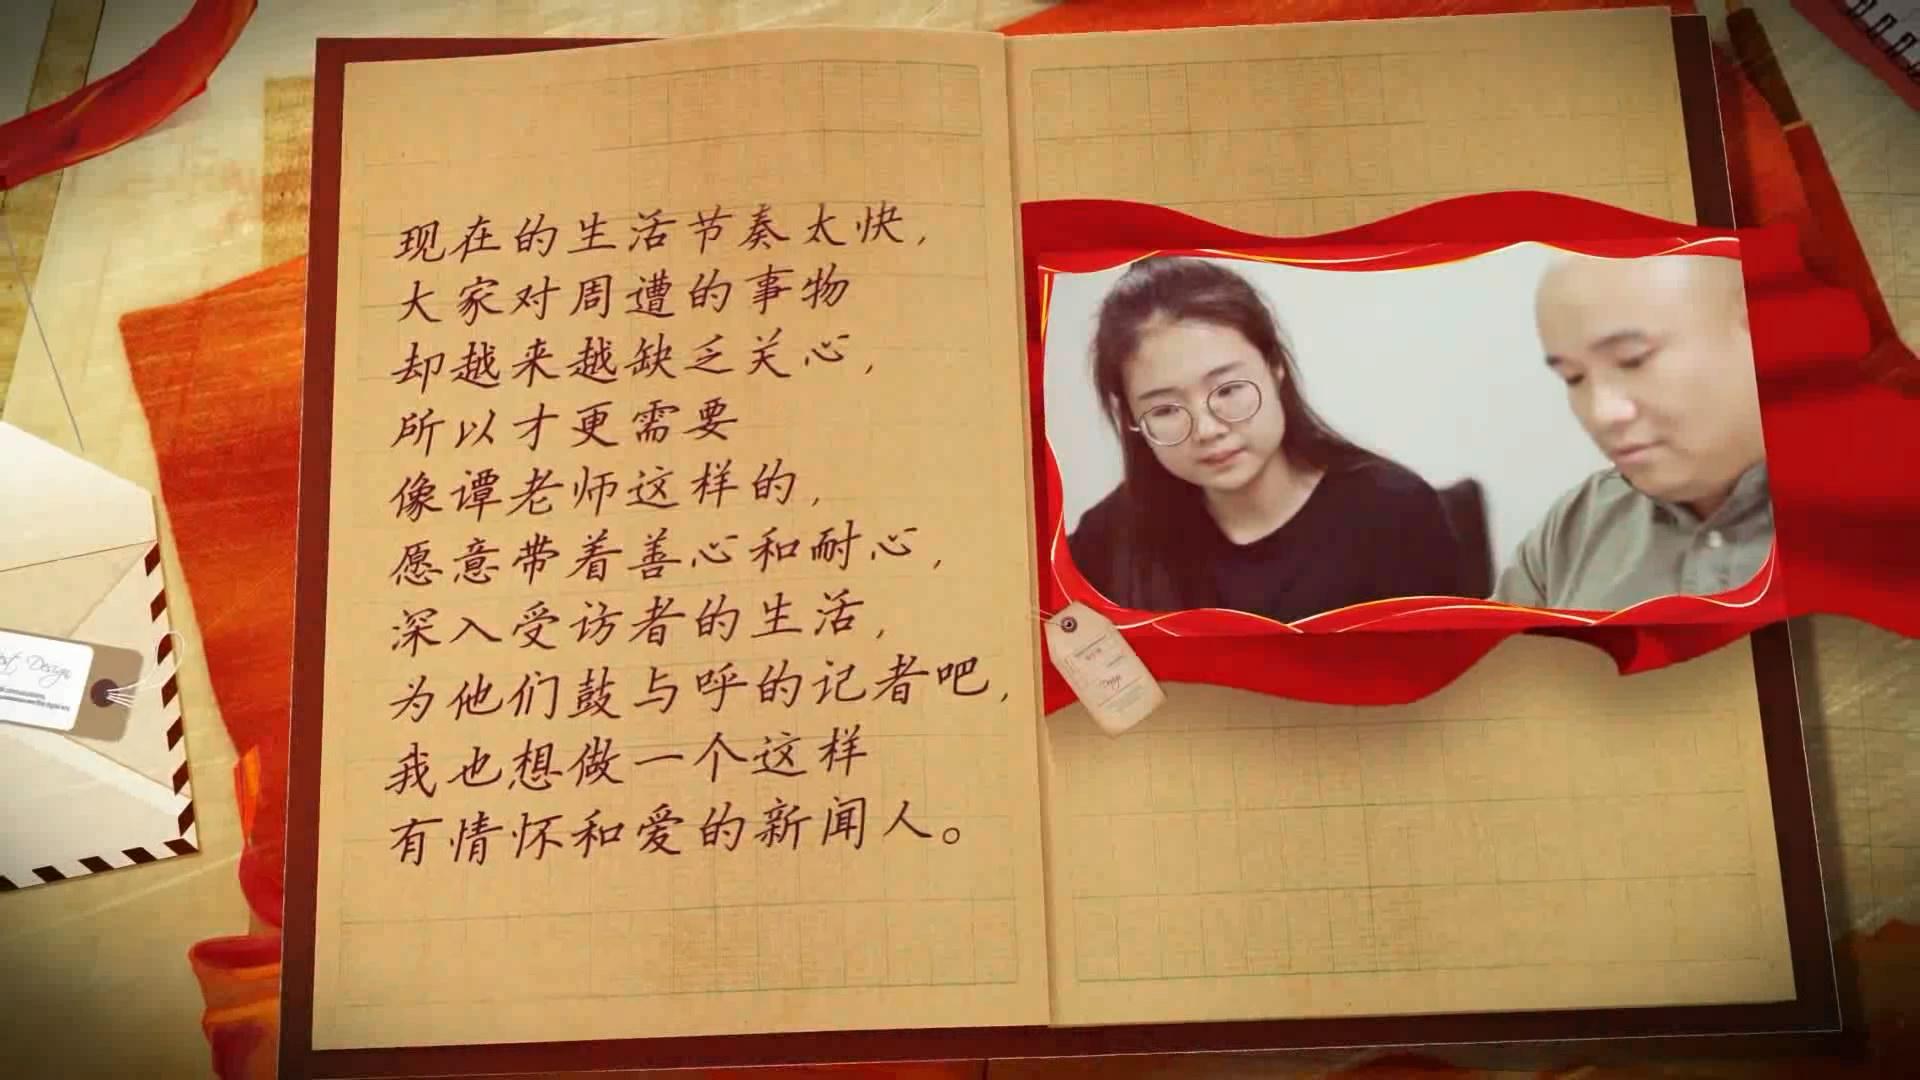 P1-大学生体验中国好人记者谭[00_15_08][20181112-095100-0].JPG